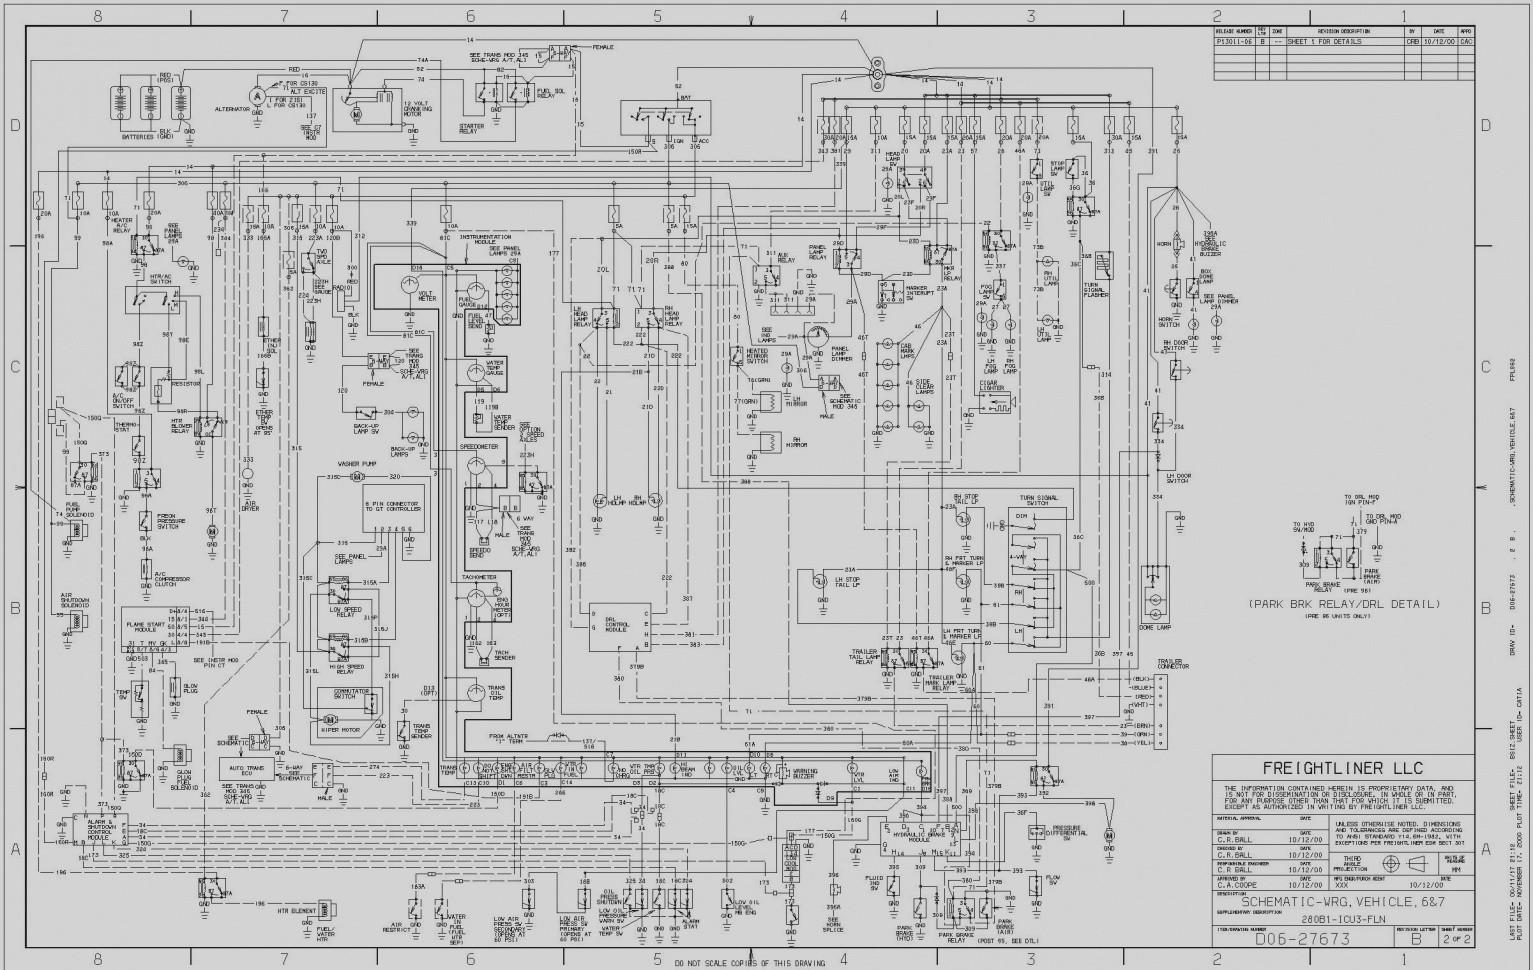 diagram] freightliner fld 120 wiring diagram full version hd quality wiring  diagram - dexter.pachuka.it  diagram database - pachuka.it